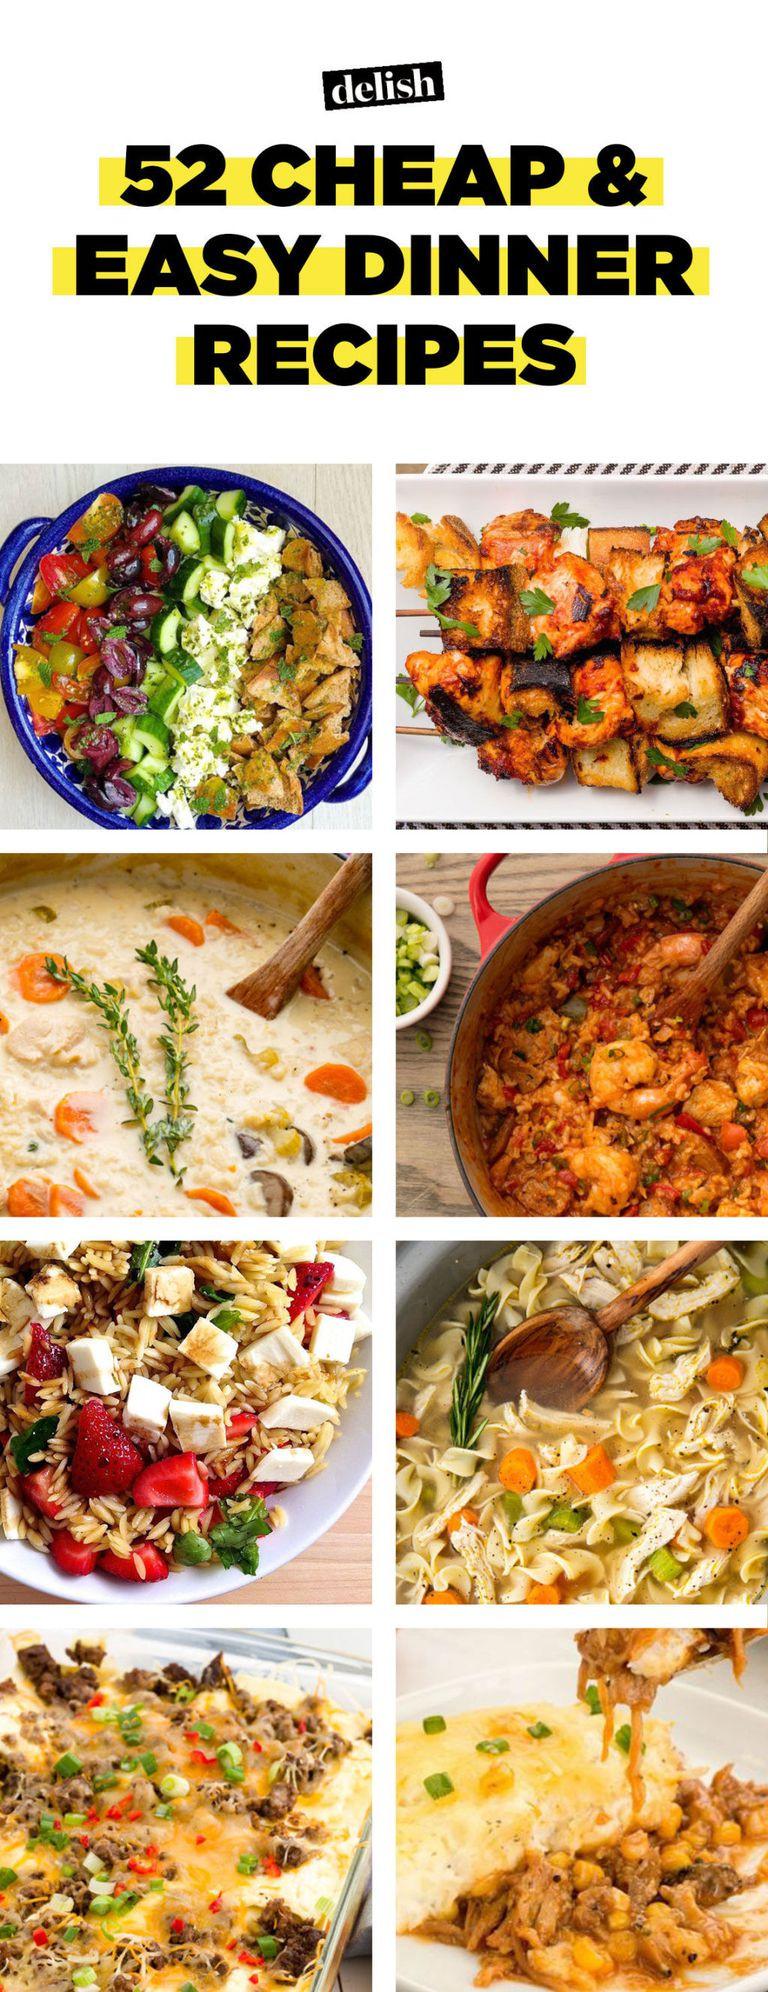 Cheap Dinner Ideas  52 Easy Cheap Recipes – Inexpensive Food Ideas—Delish